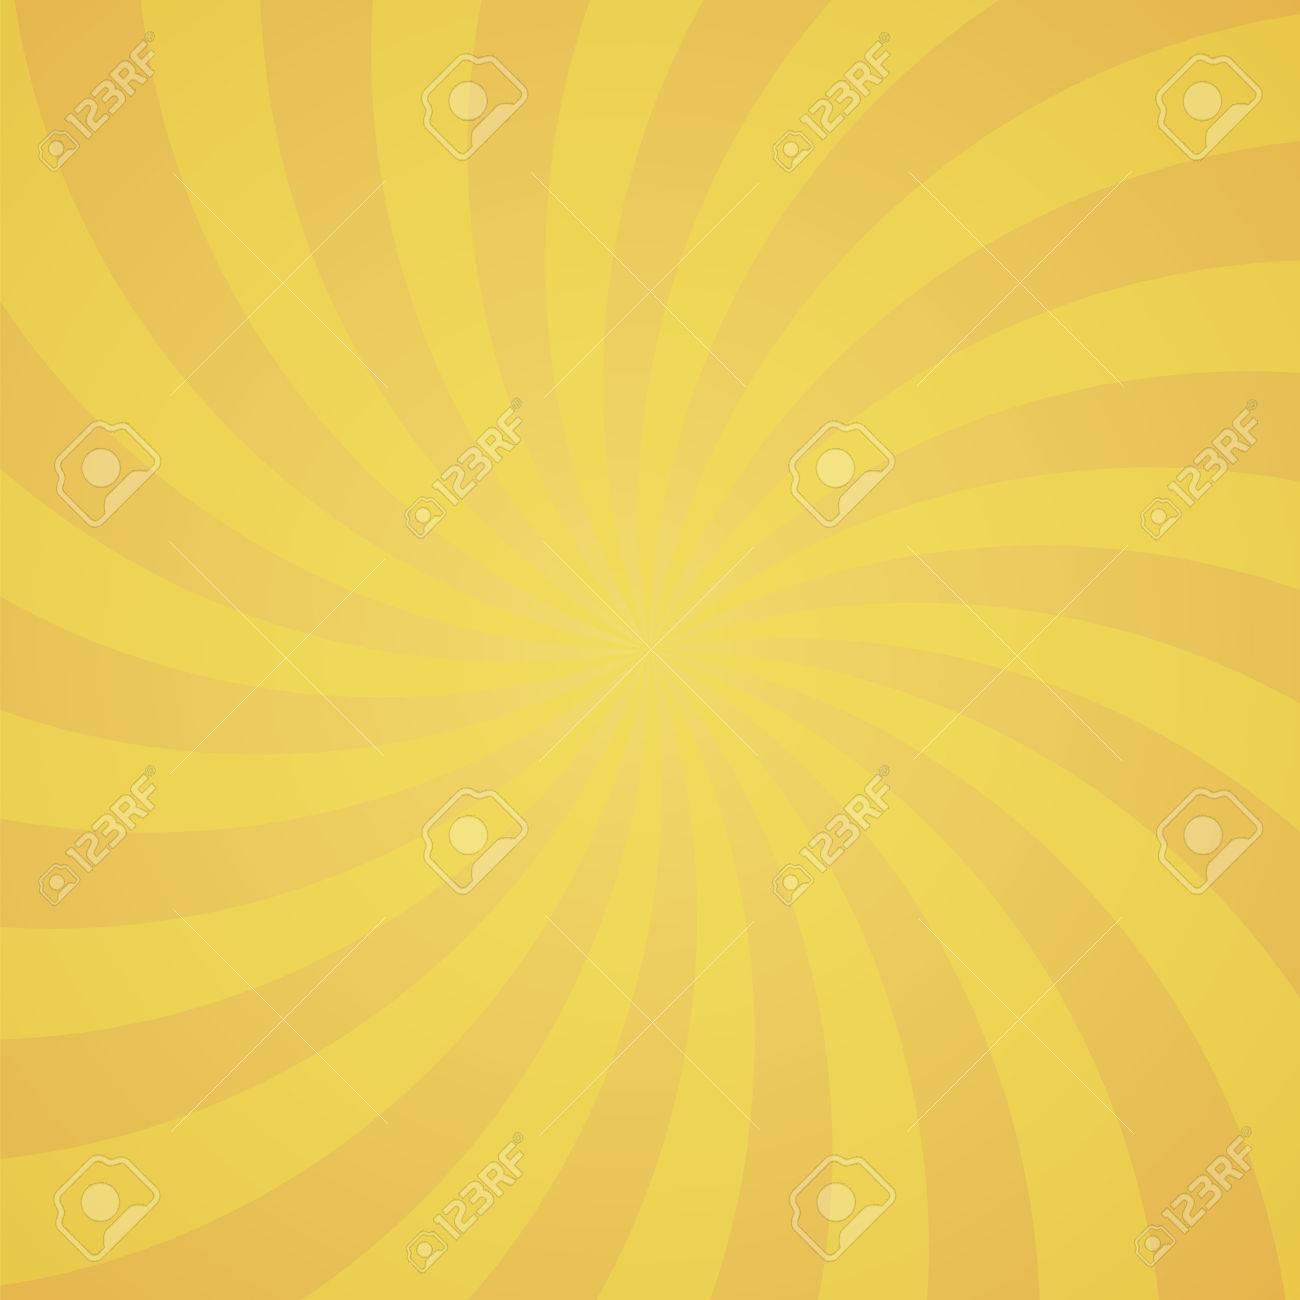 Orange Color Circle Swirl Burst Background Vector Illustration Stock